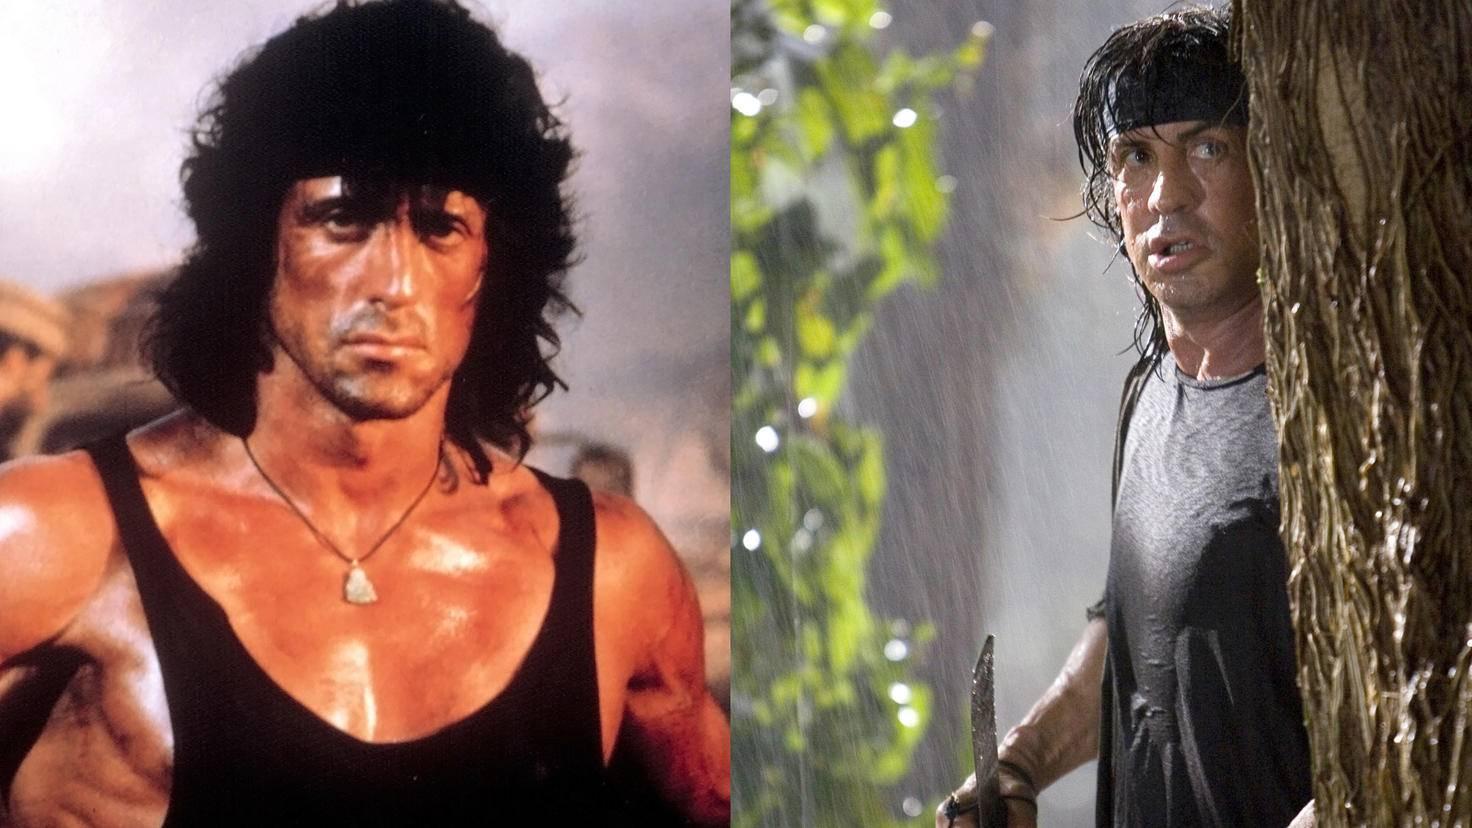 Rambo 3-1988-picture alliance-Everett Collection-93010352-Rambo-John Rambo-2008-picture alliance-Everett Collection-93359331